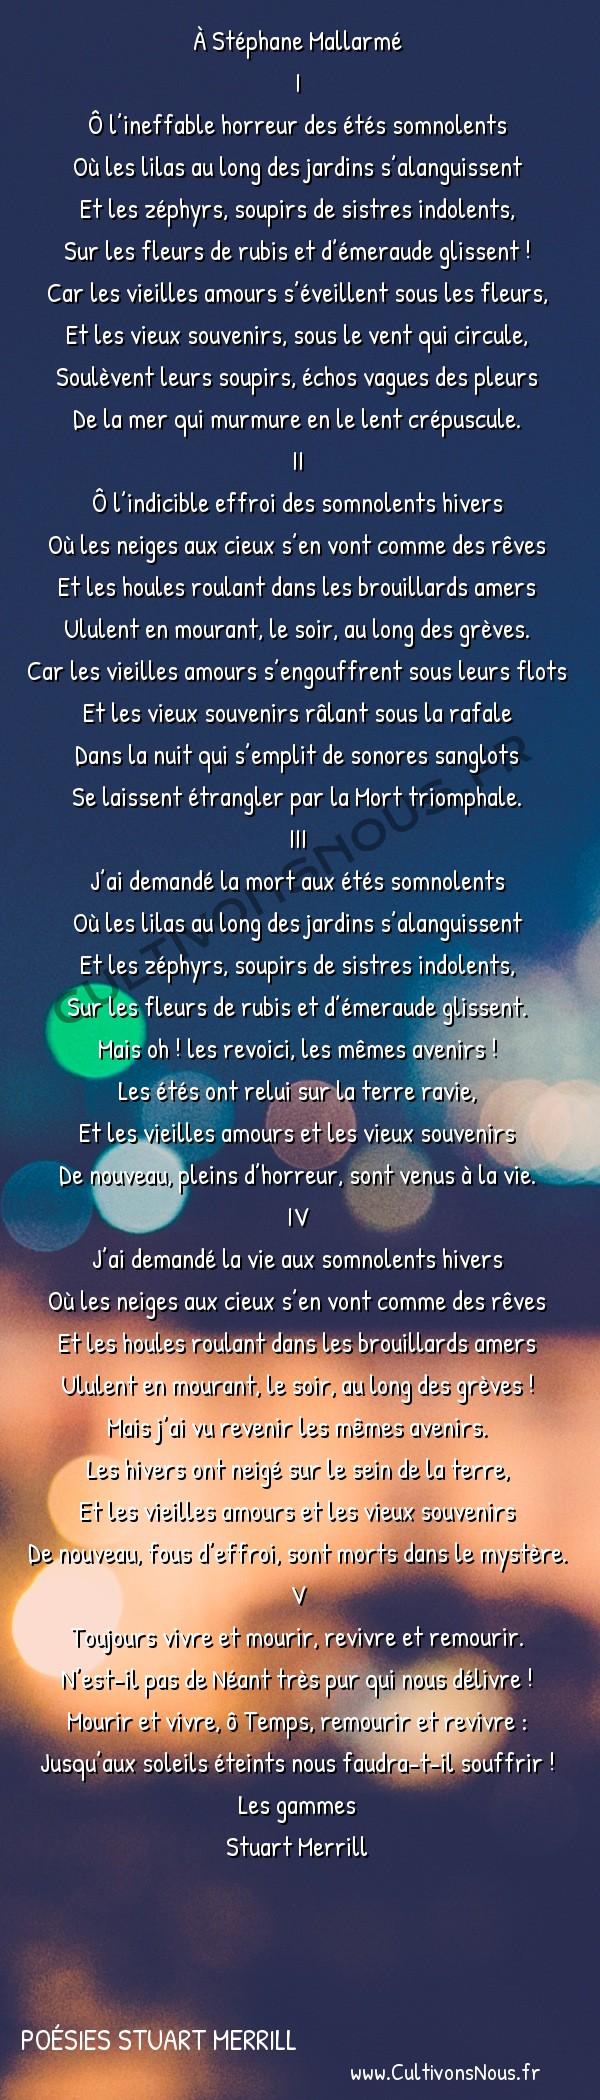 Poésies Stuart Merrill - Les gammes - Refrains mélancoliques -  À Stéphane Mallarmé I